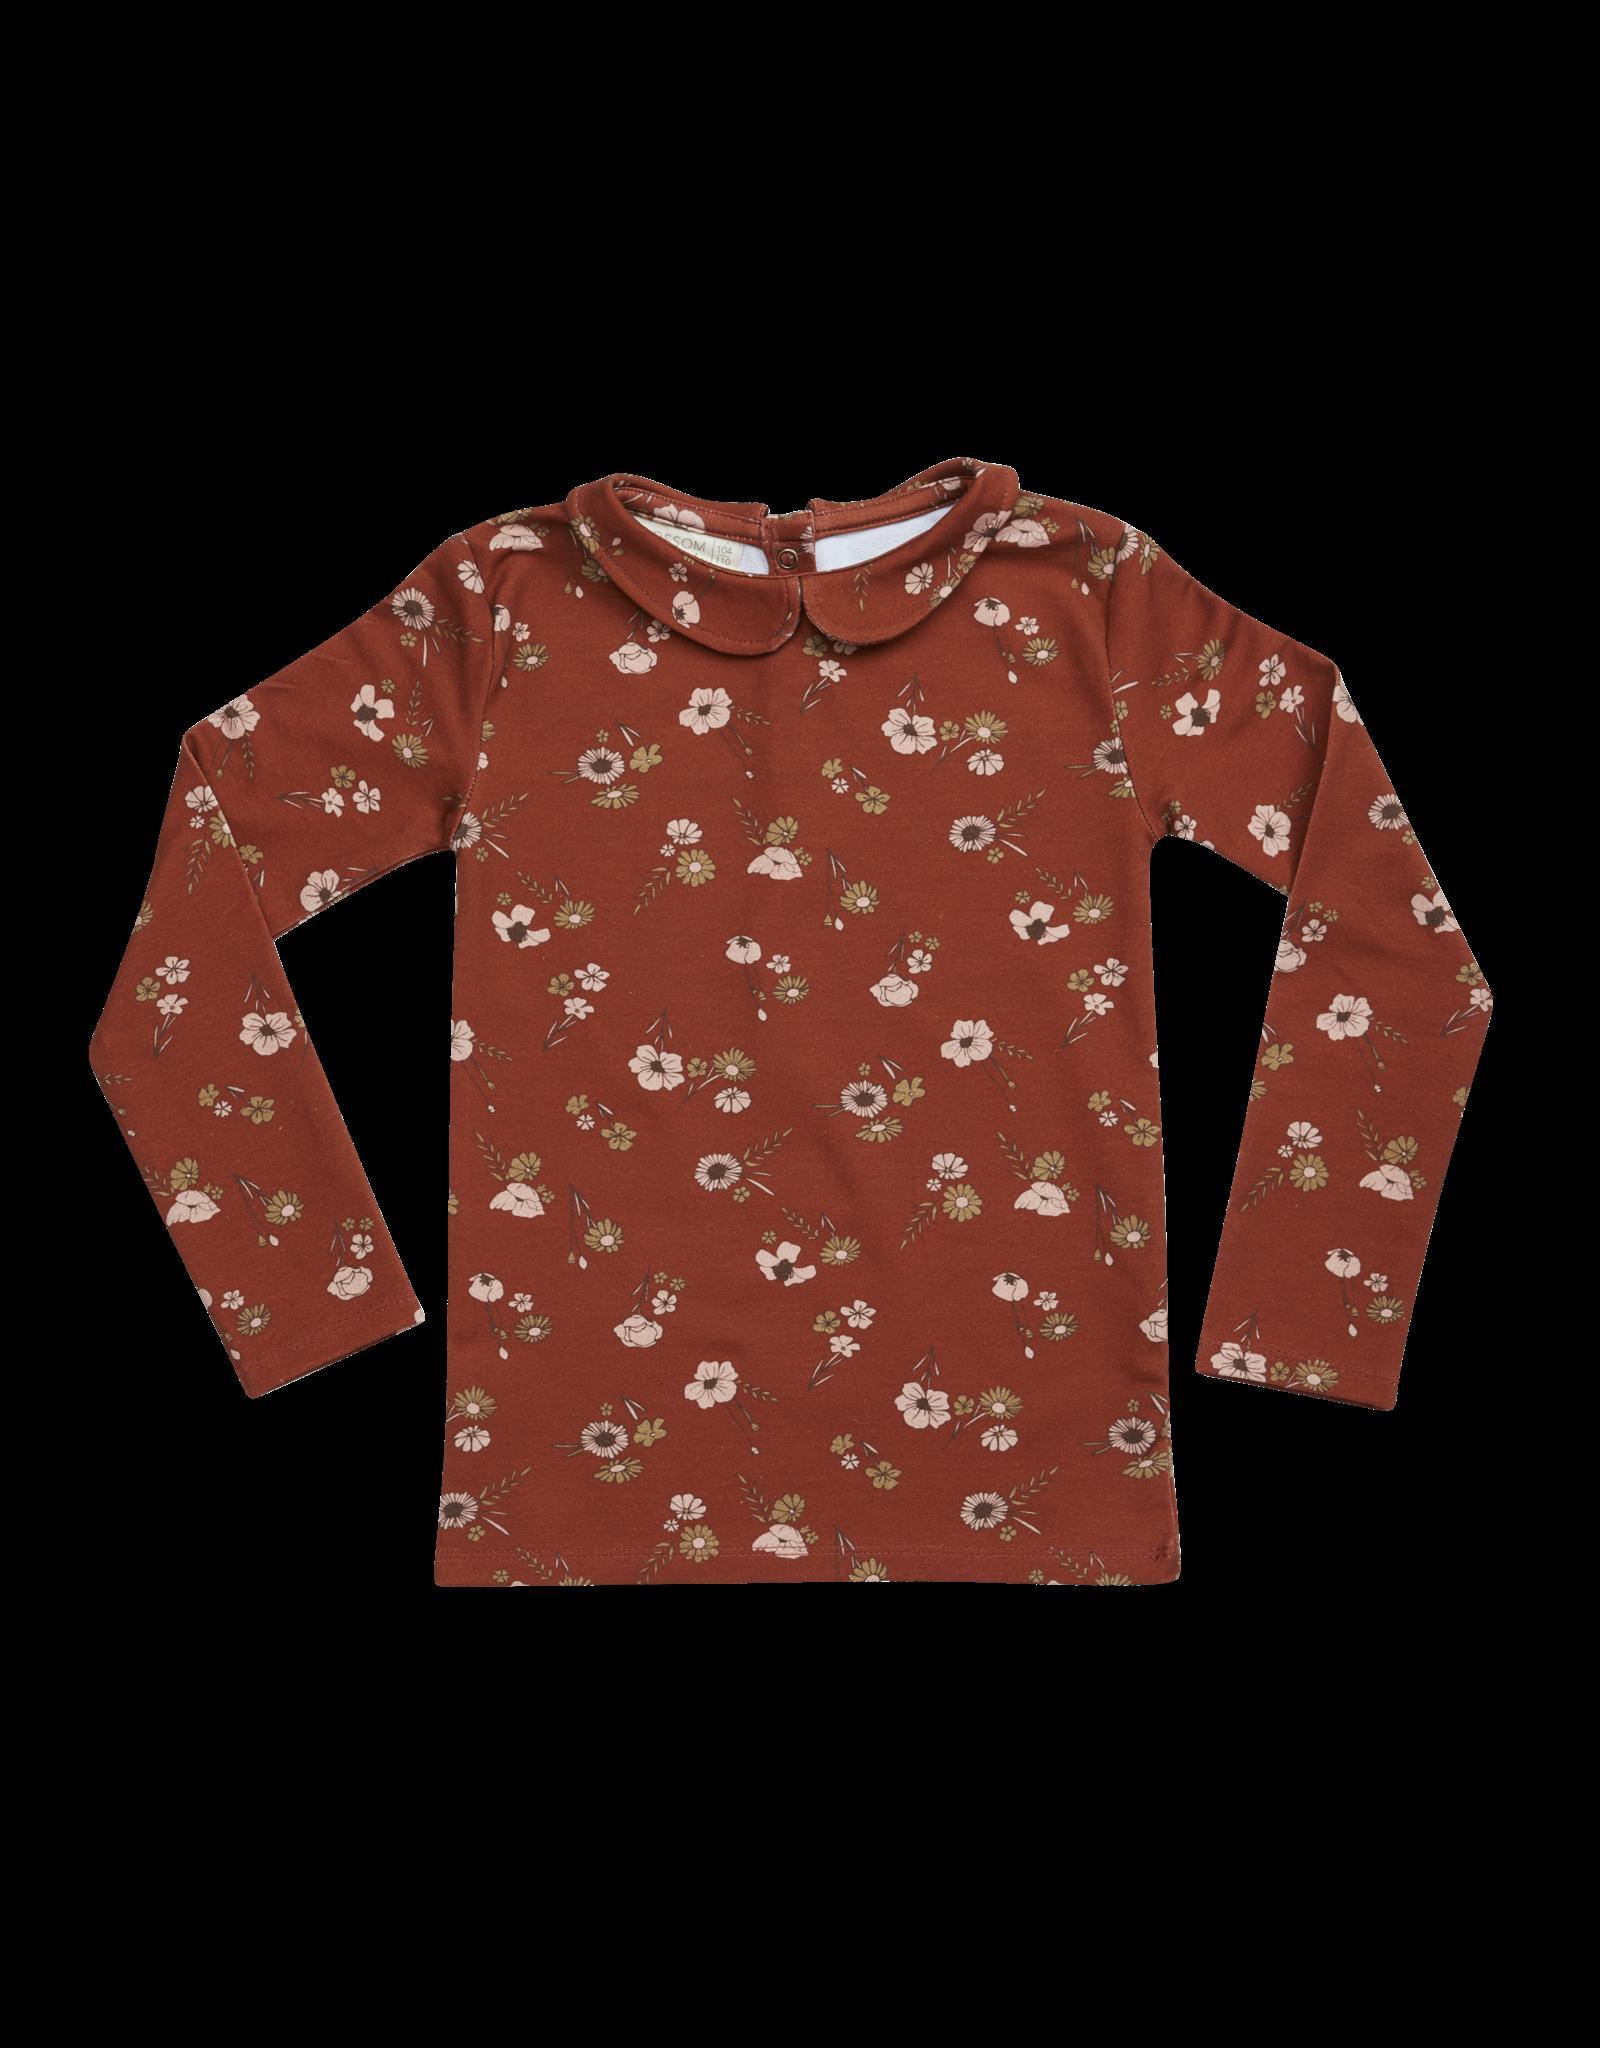 Blossom Kids Long sleeve shirt - Festive Floral